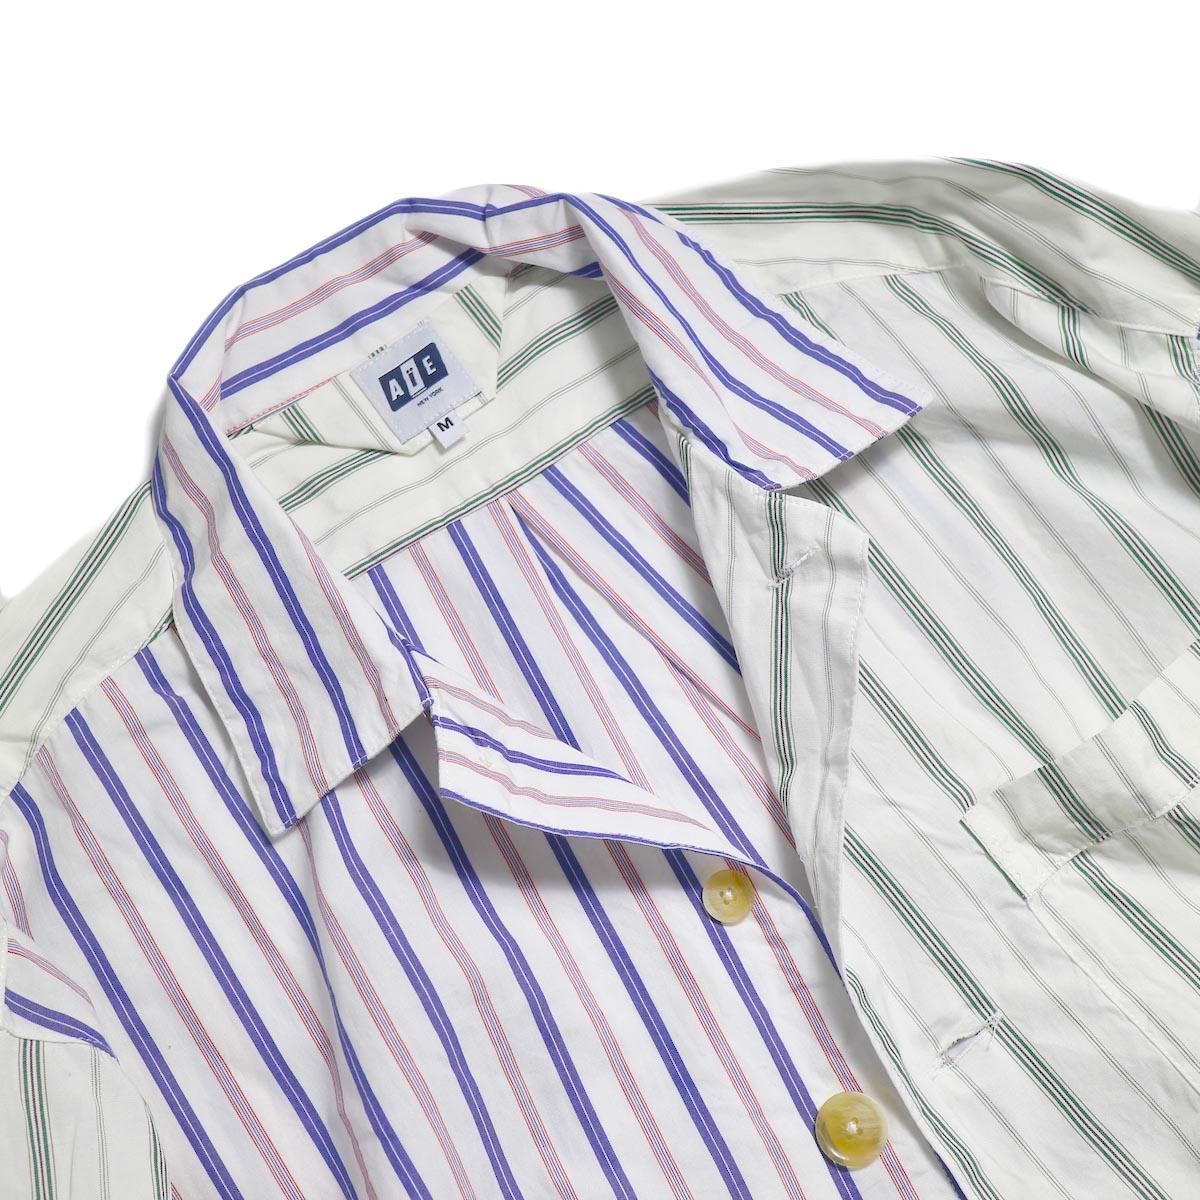 AiE / PJ Shirt -Regent St. (Red/Blu/Wht) 襟